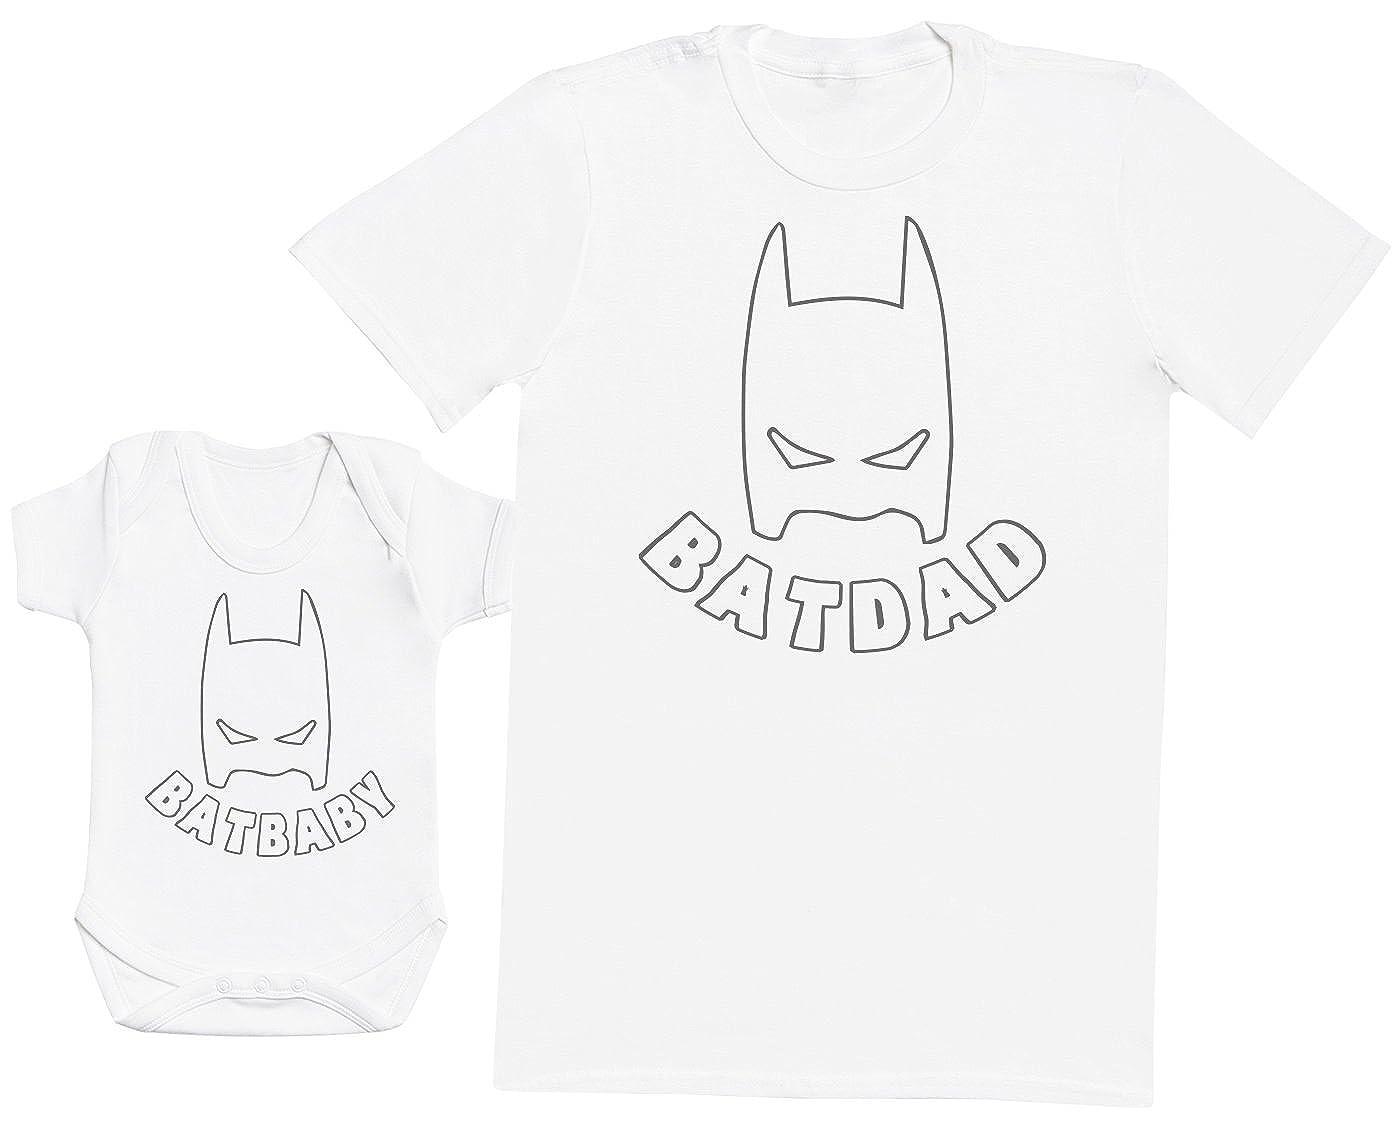 Zarlivia Clothing Bat Baby & Bat Dad - Ensemble Père Bébé Cadeau - Hommes T-Shirt & Body bébé G-10-D-BB